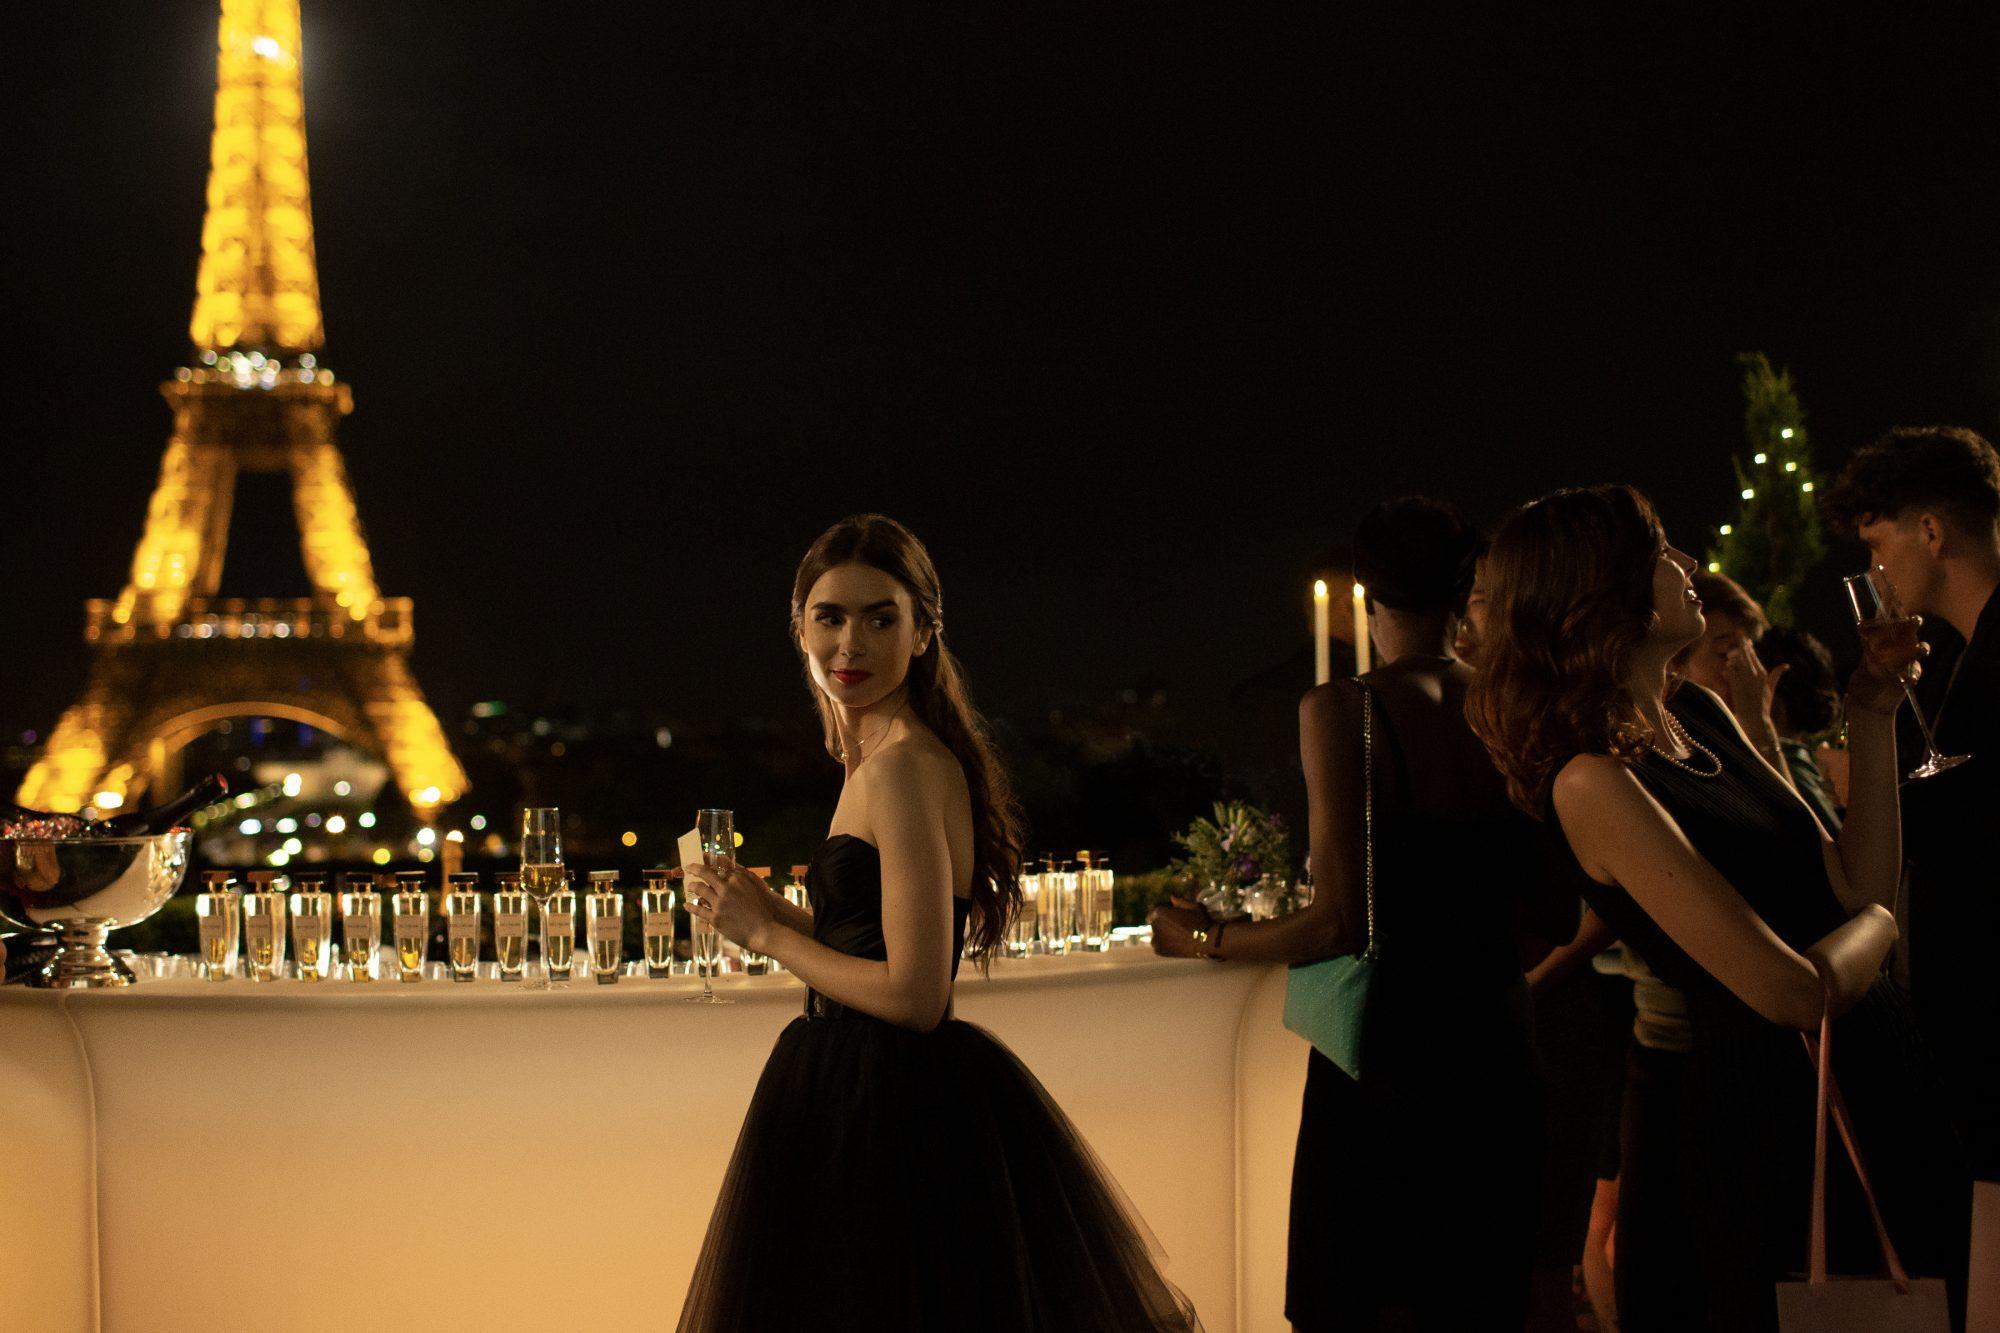 Emily in Paris Temporada 1 final, explicado 1